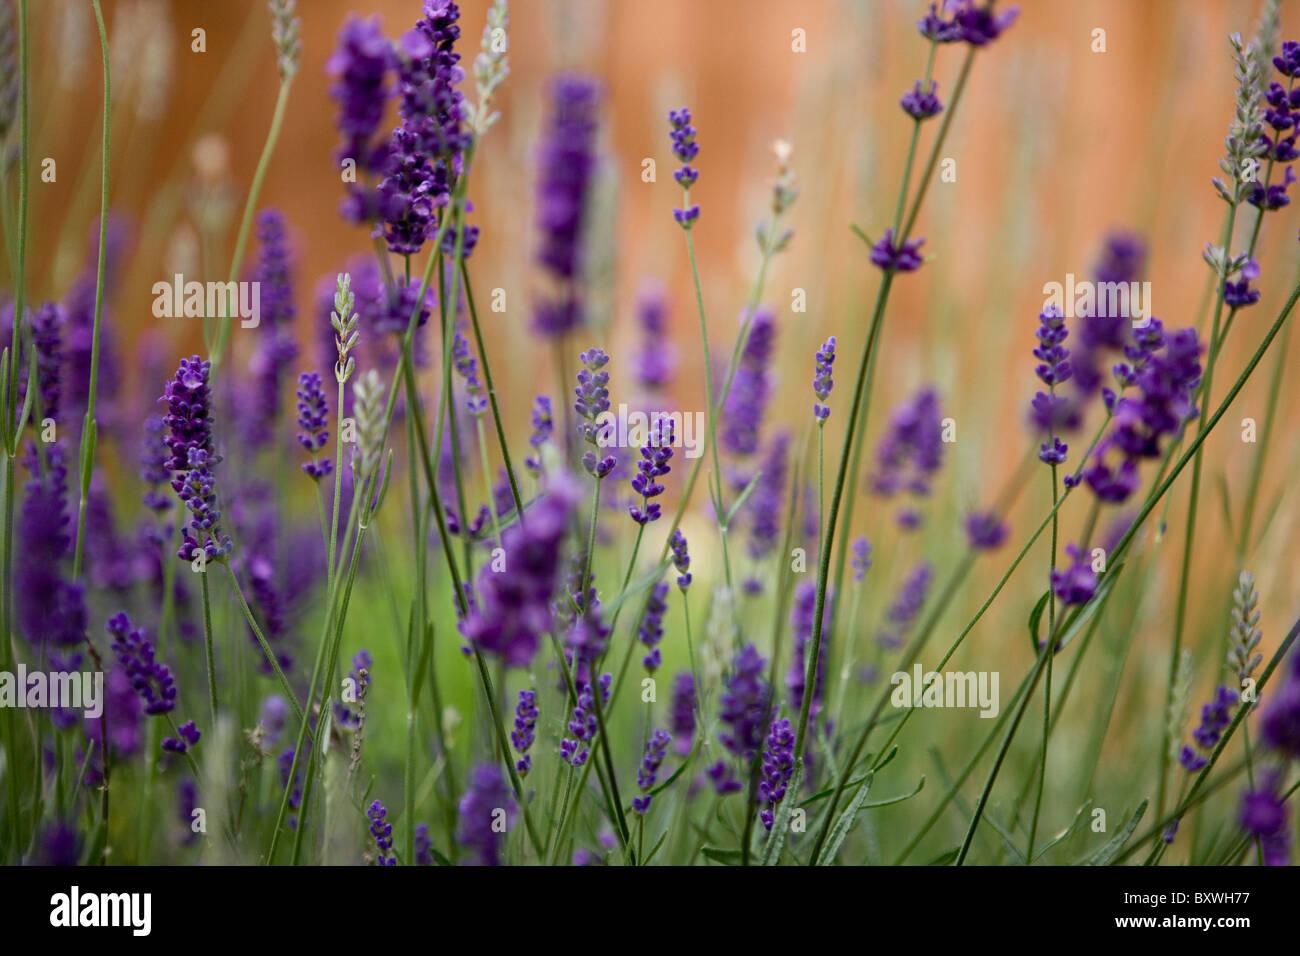 lavendel pflanze stockfoto bild 33753755 alamy. Black Bedroom Furniture Sets. Home Design Ideas